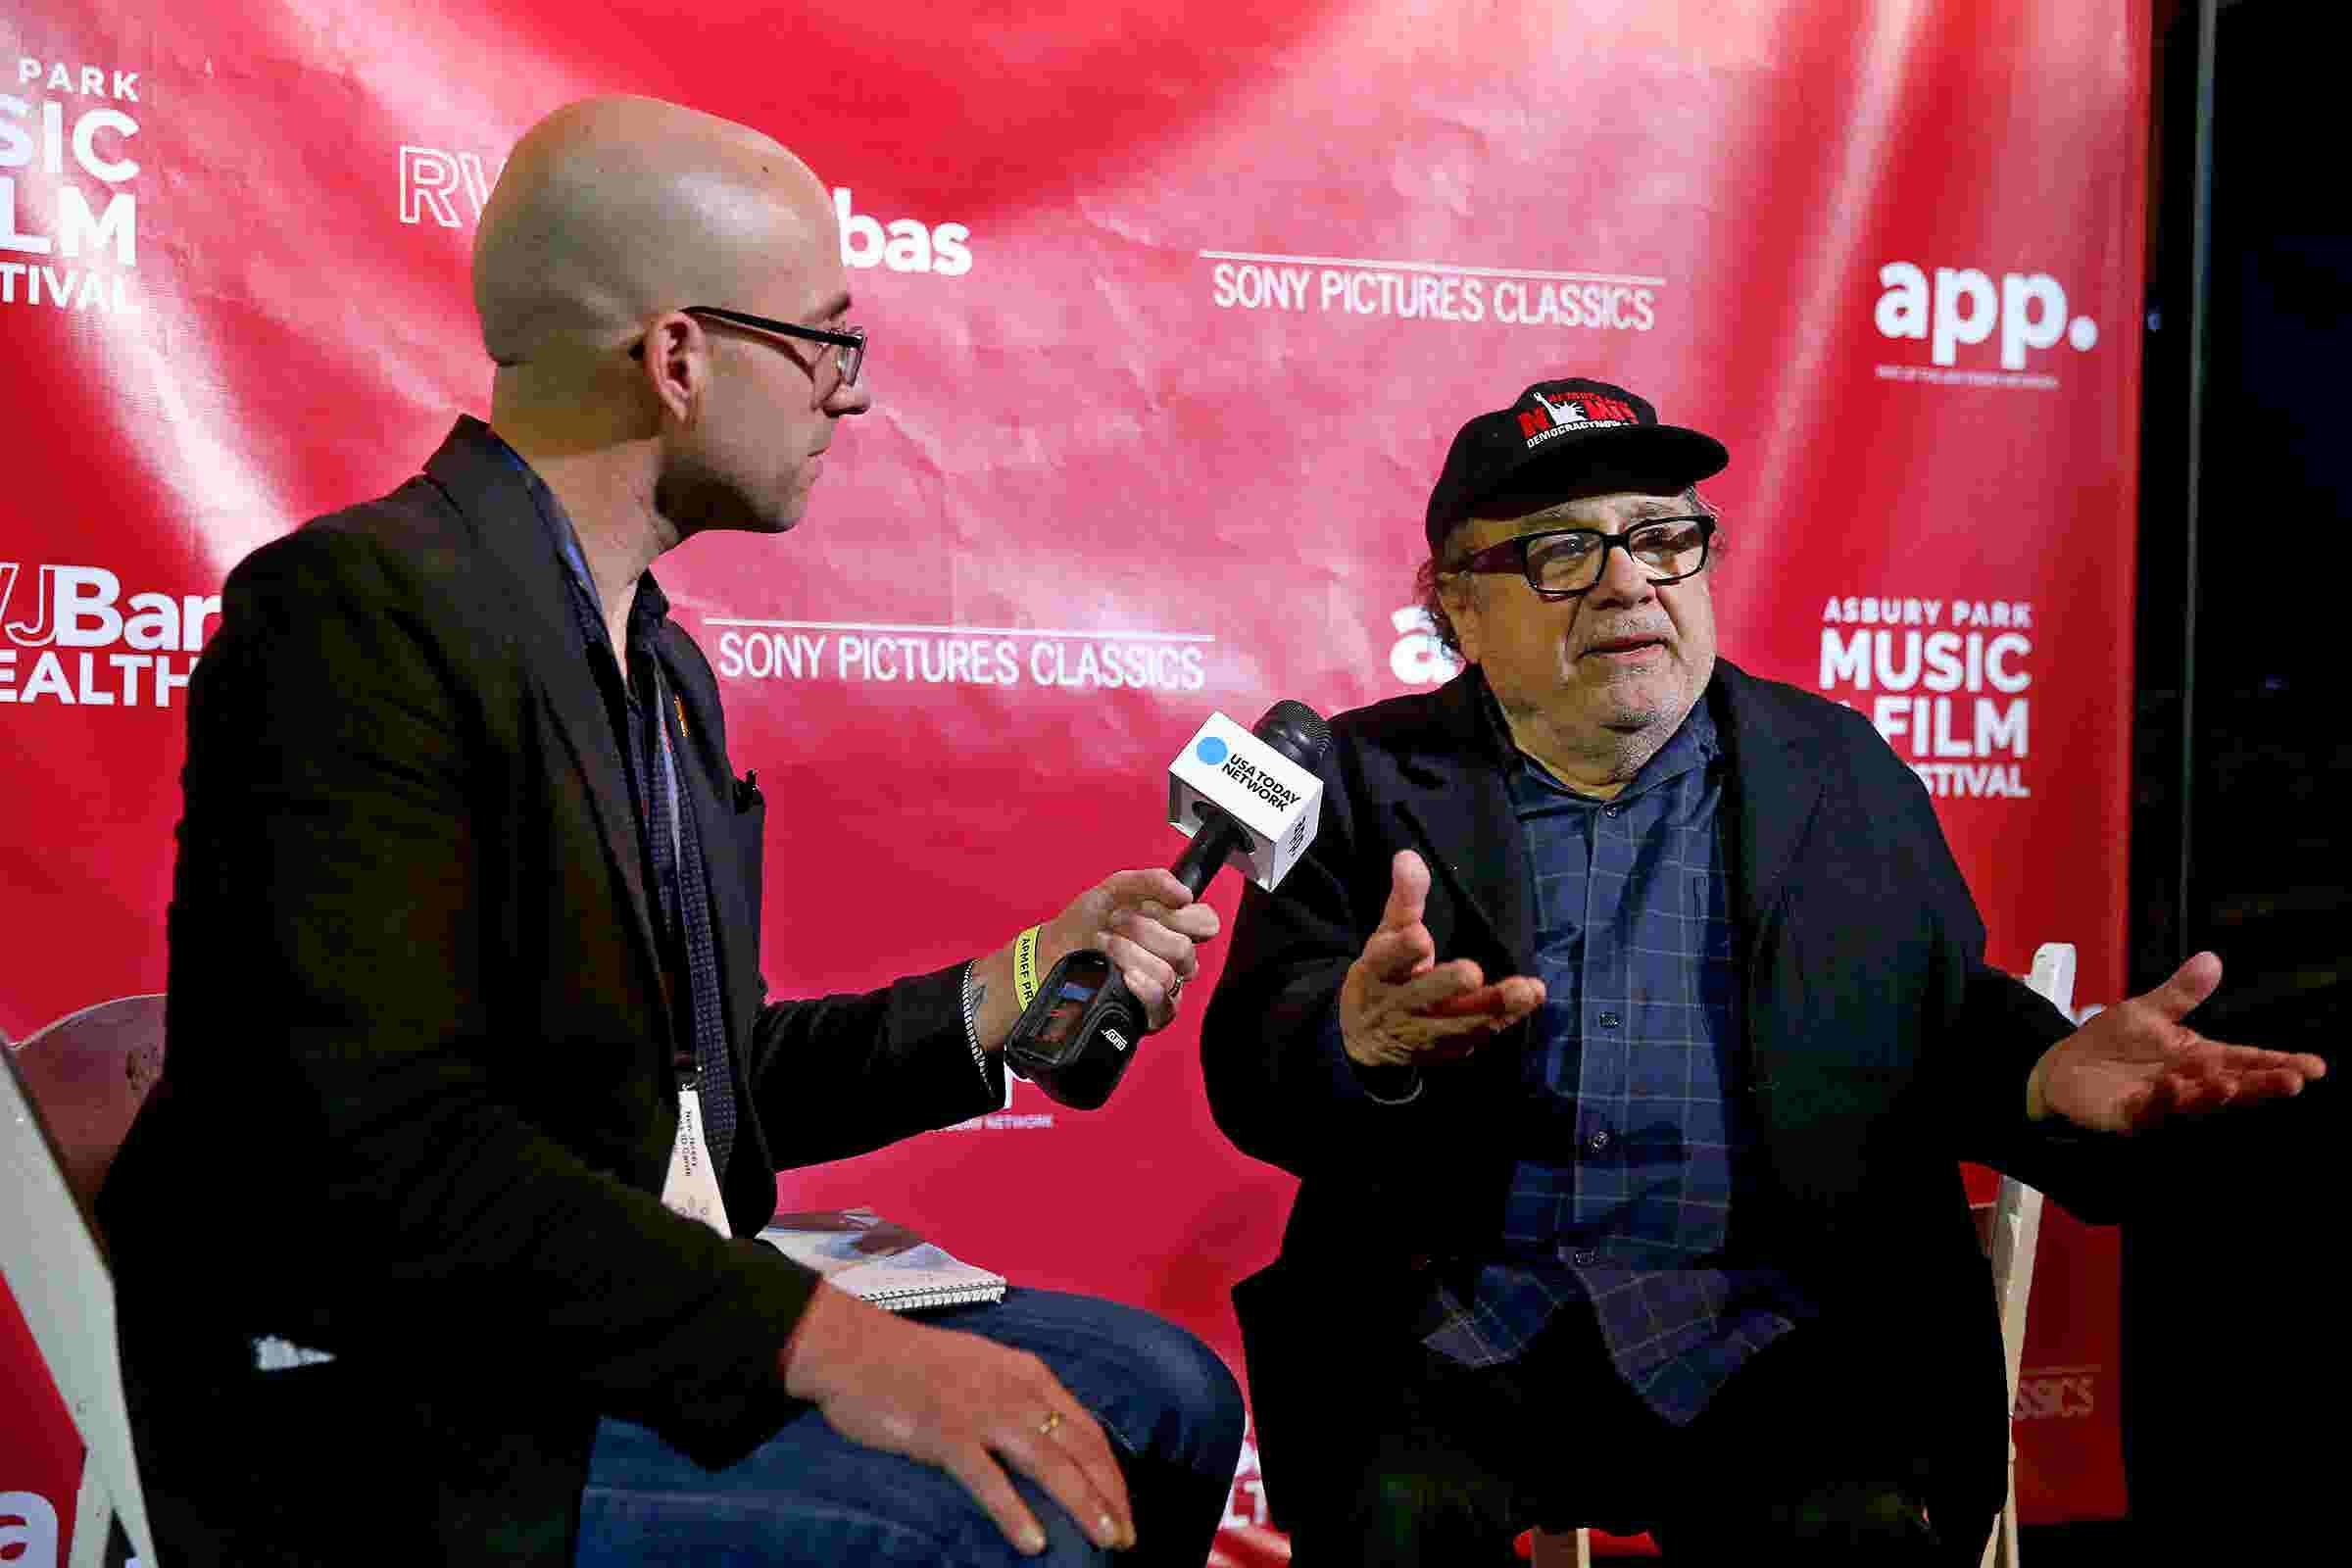 APMFF: Danny DeVito Day in Asbury Park